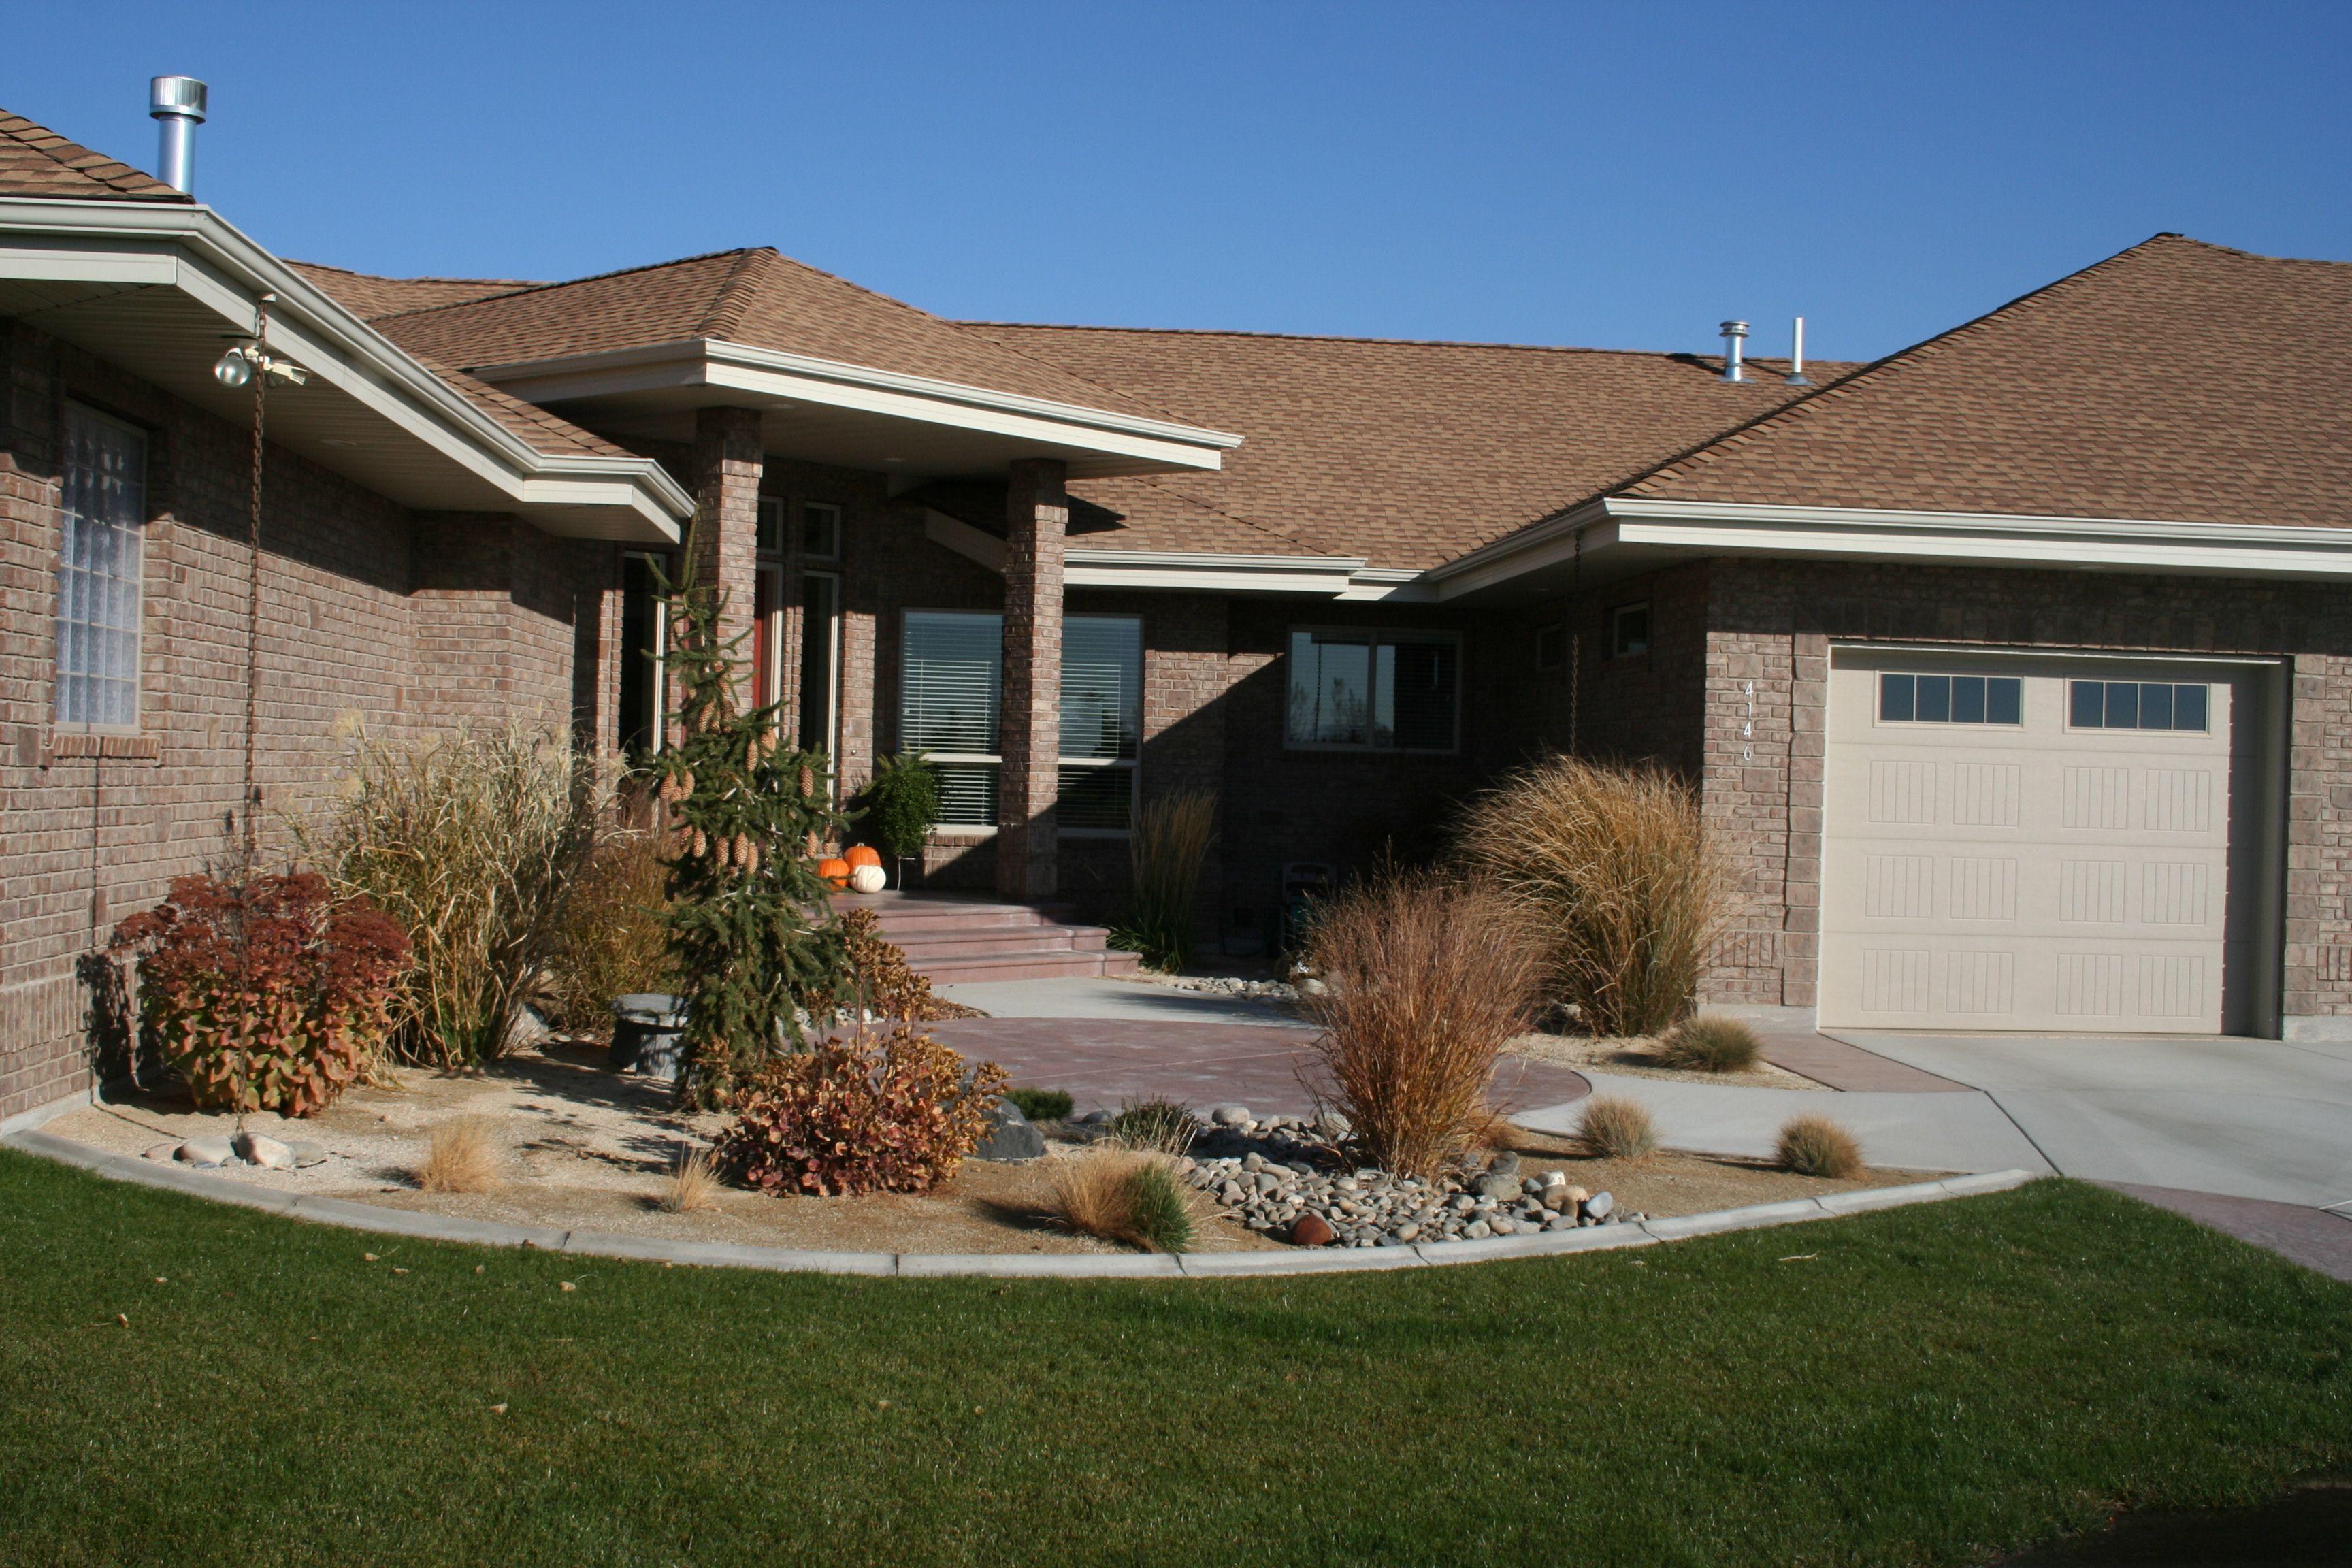 Diy Home Design Ideas Com: Beautiful Front Yards